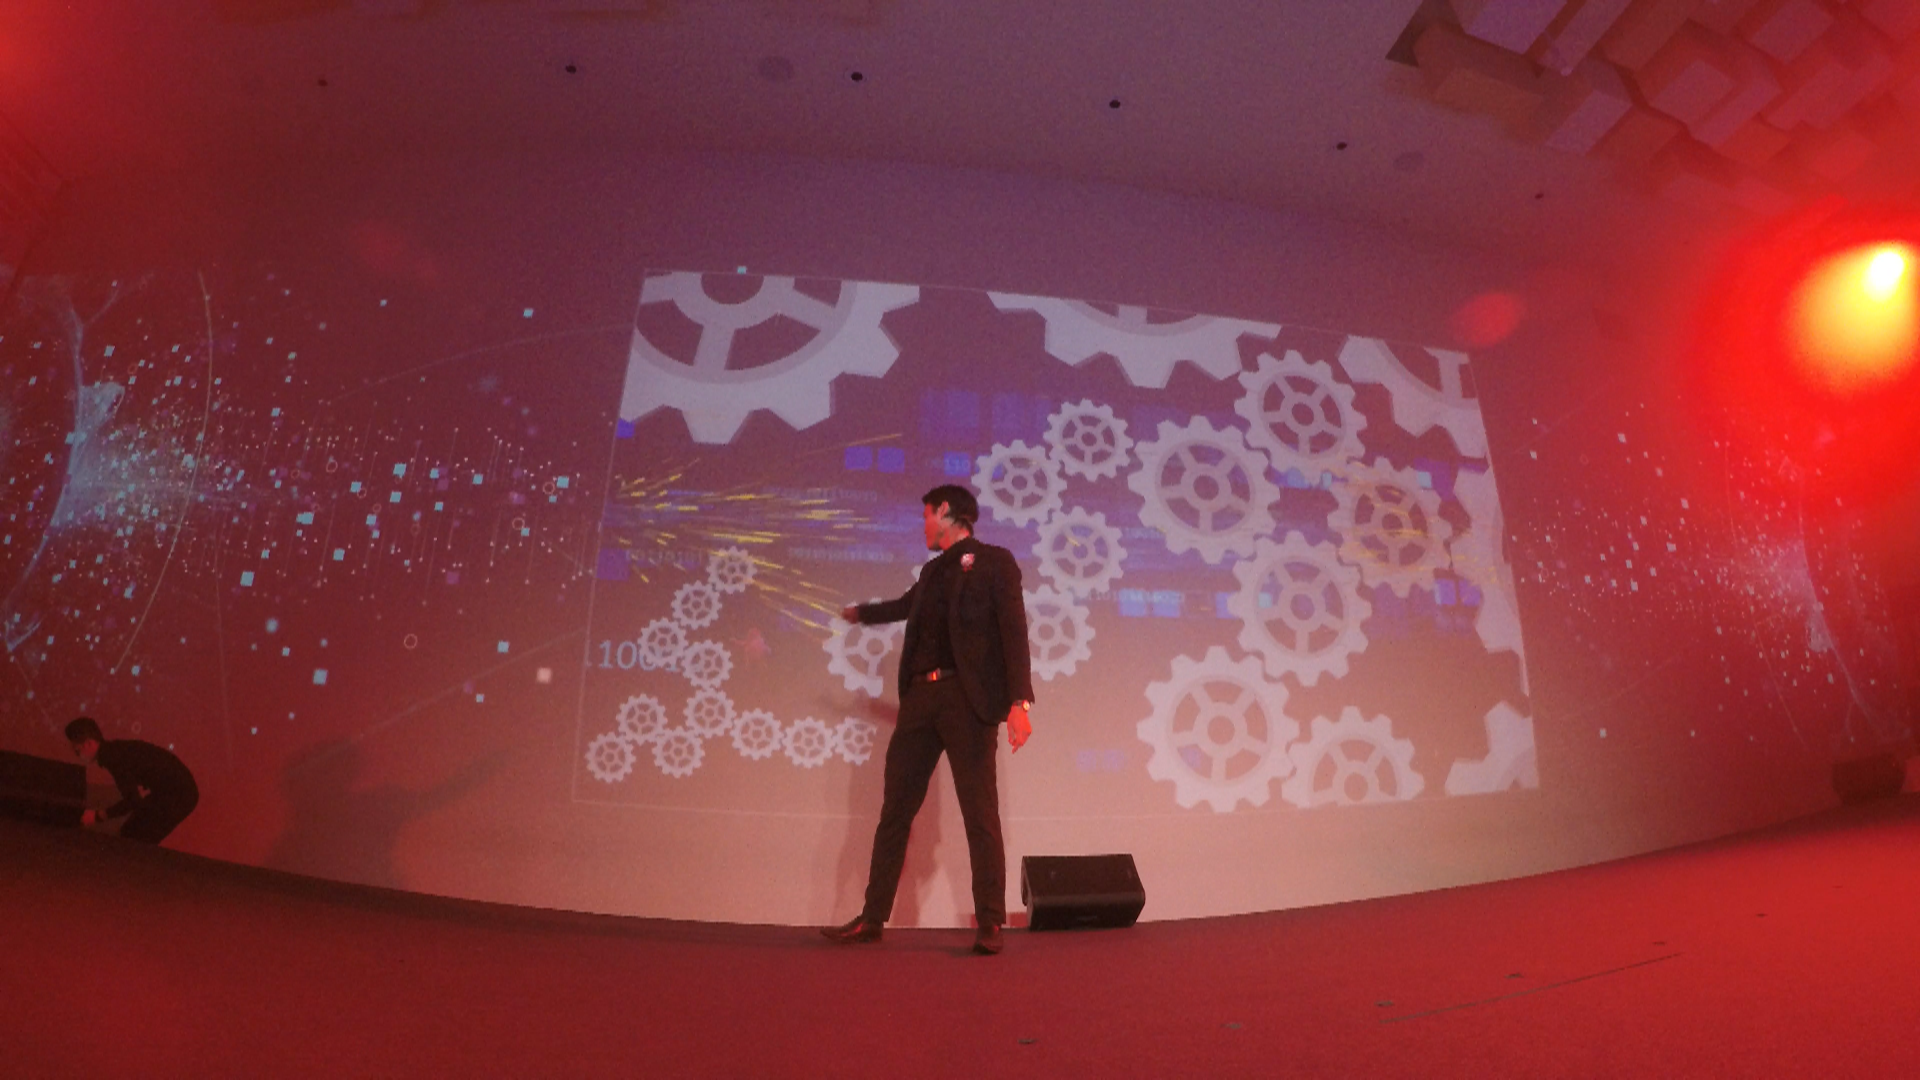 animation magician alexander yuen ipad magic